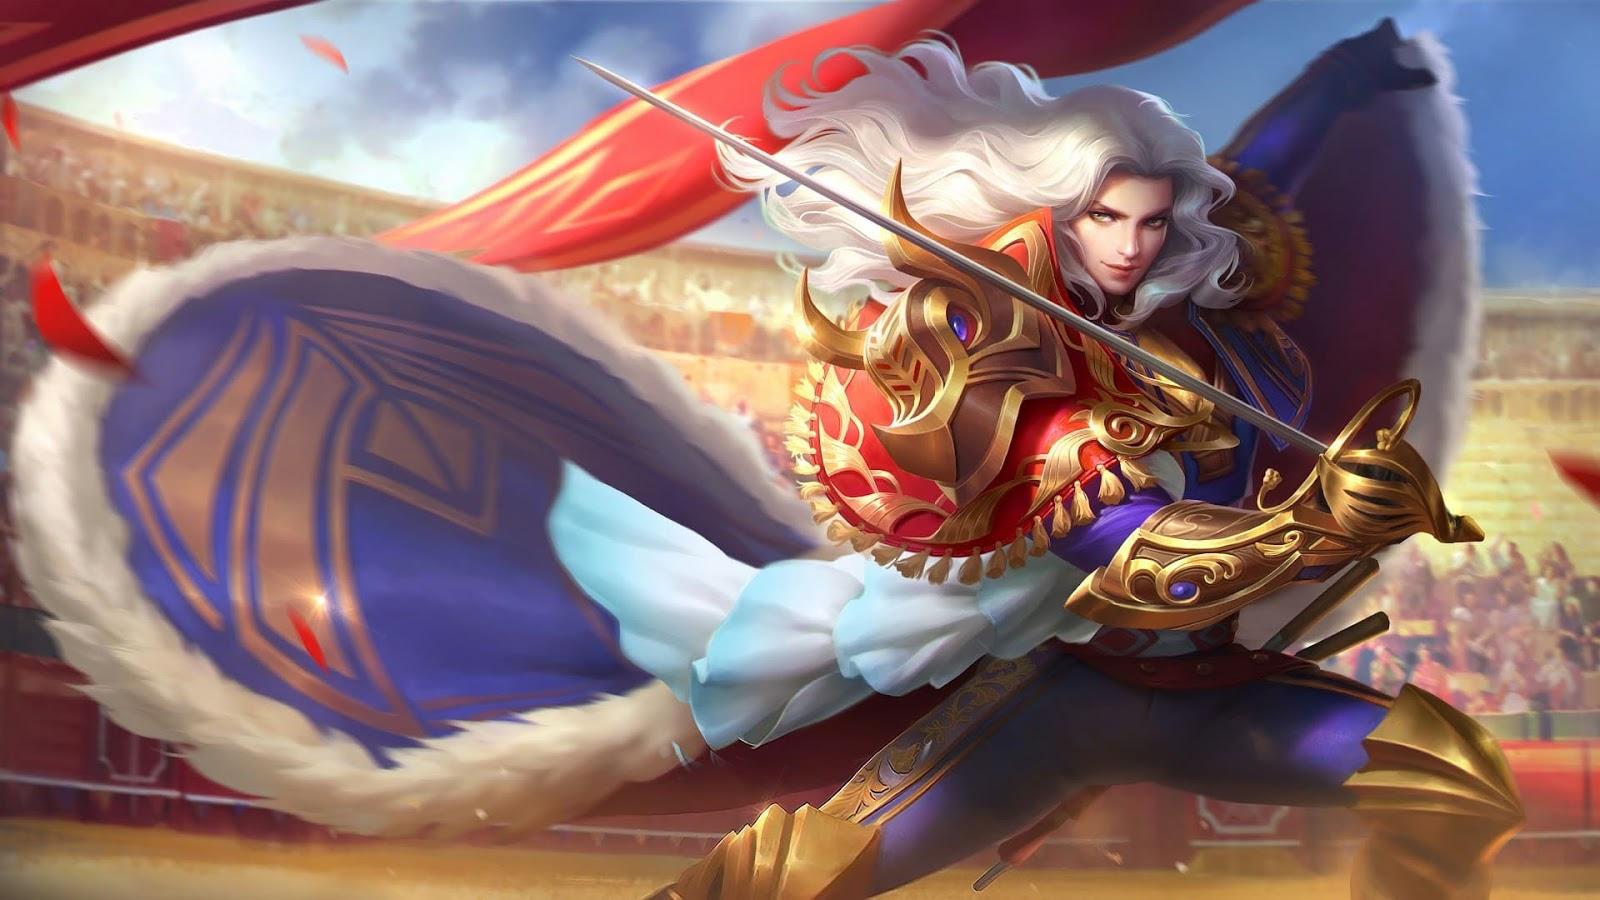 Wallpaper Lancelot Royal Matador Skin Mobile Legends HD for PC